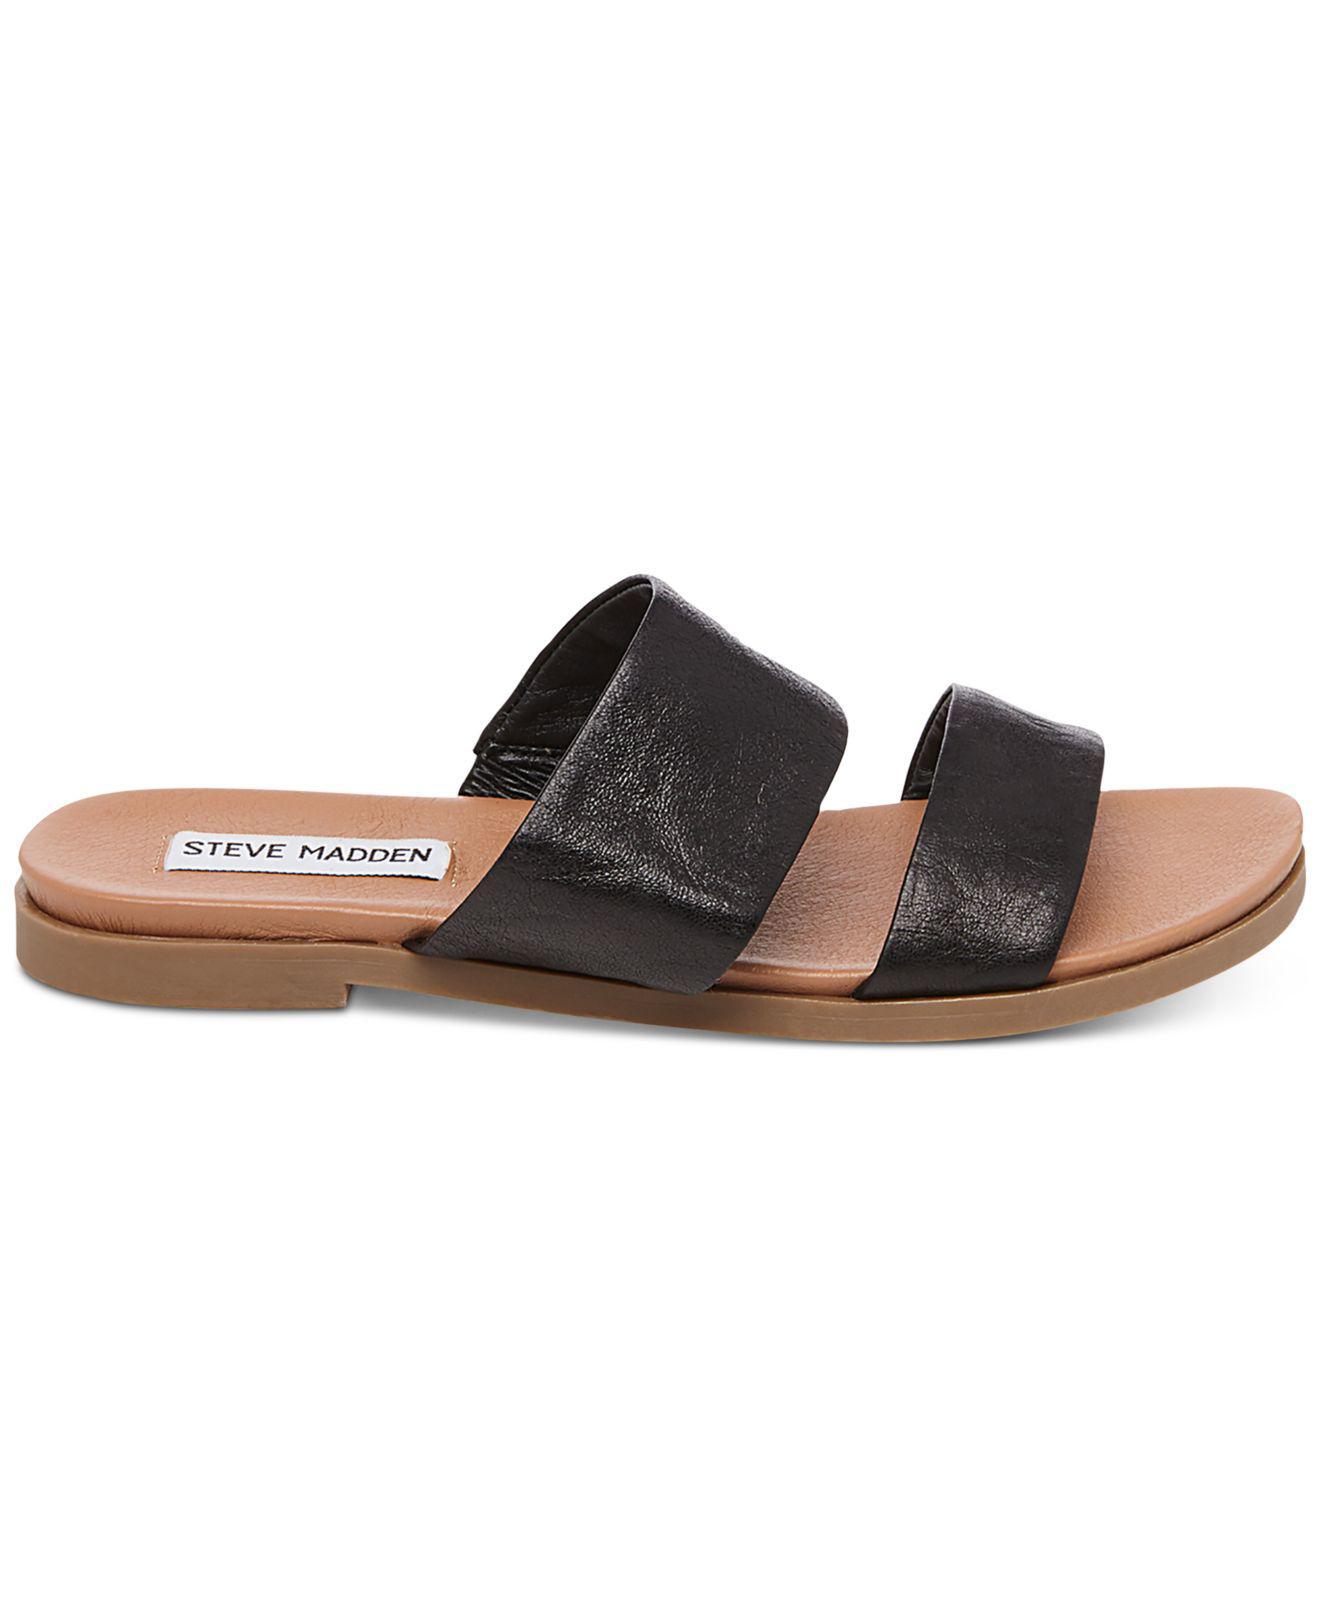 445a82c0fb64 Lyst - Steve Madden Women s Judy Flat Slide Sandals in Black